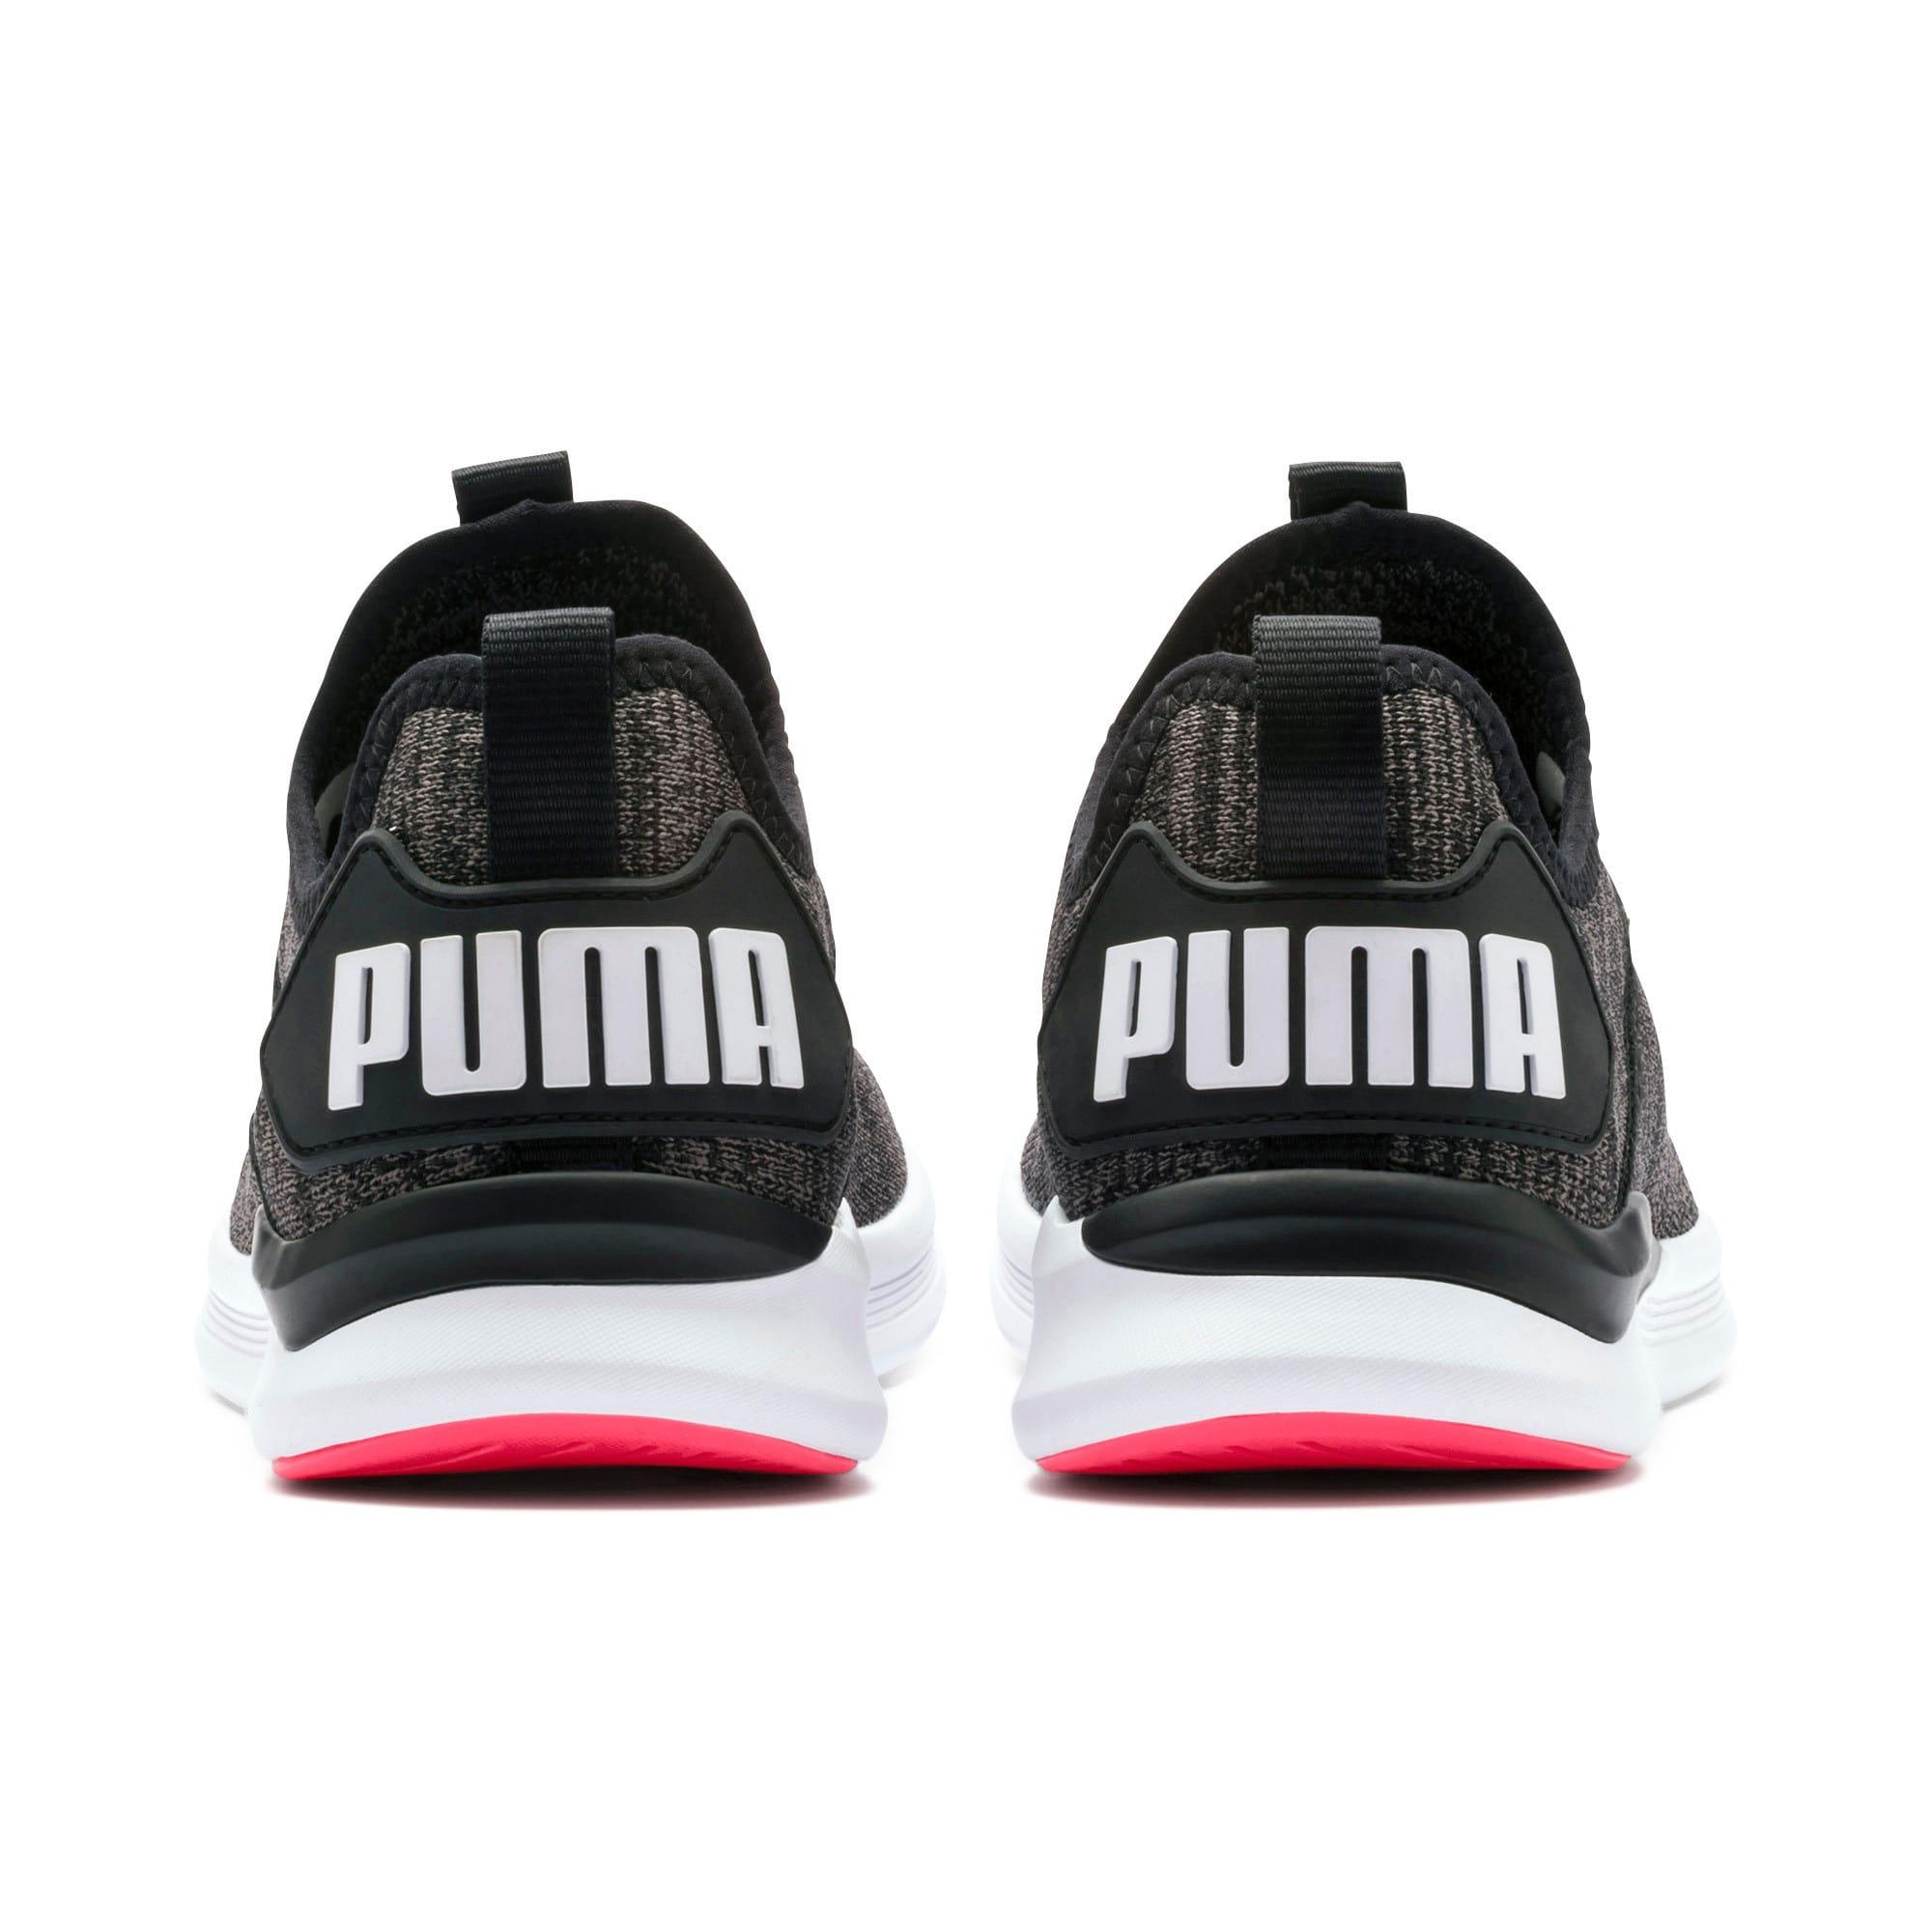 Thumbnail 4 of IGNITE Flash evoKNIT Women's Running Shoes, Black-White-Pink Alert, medium